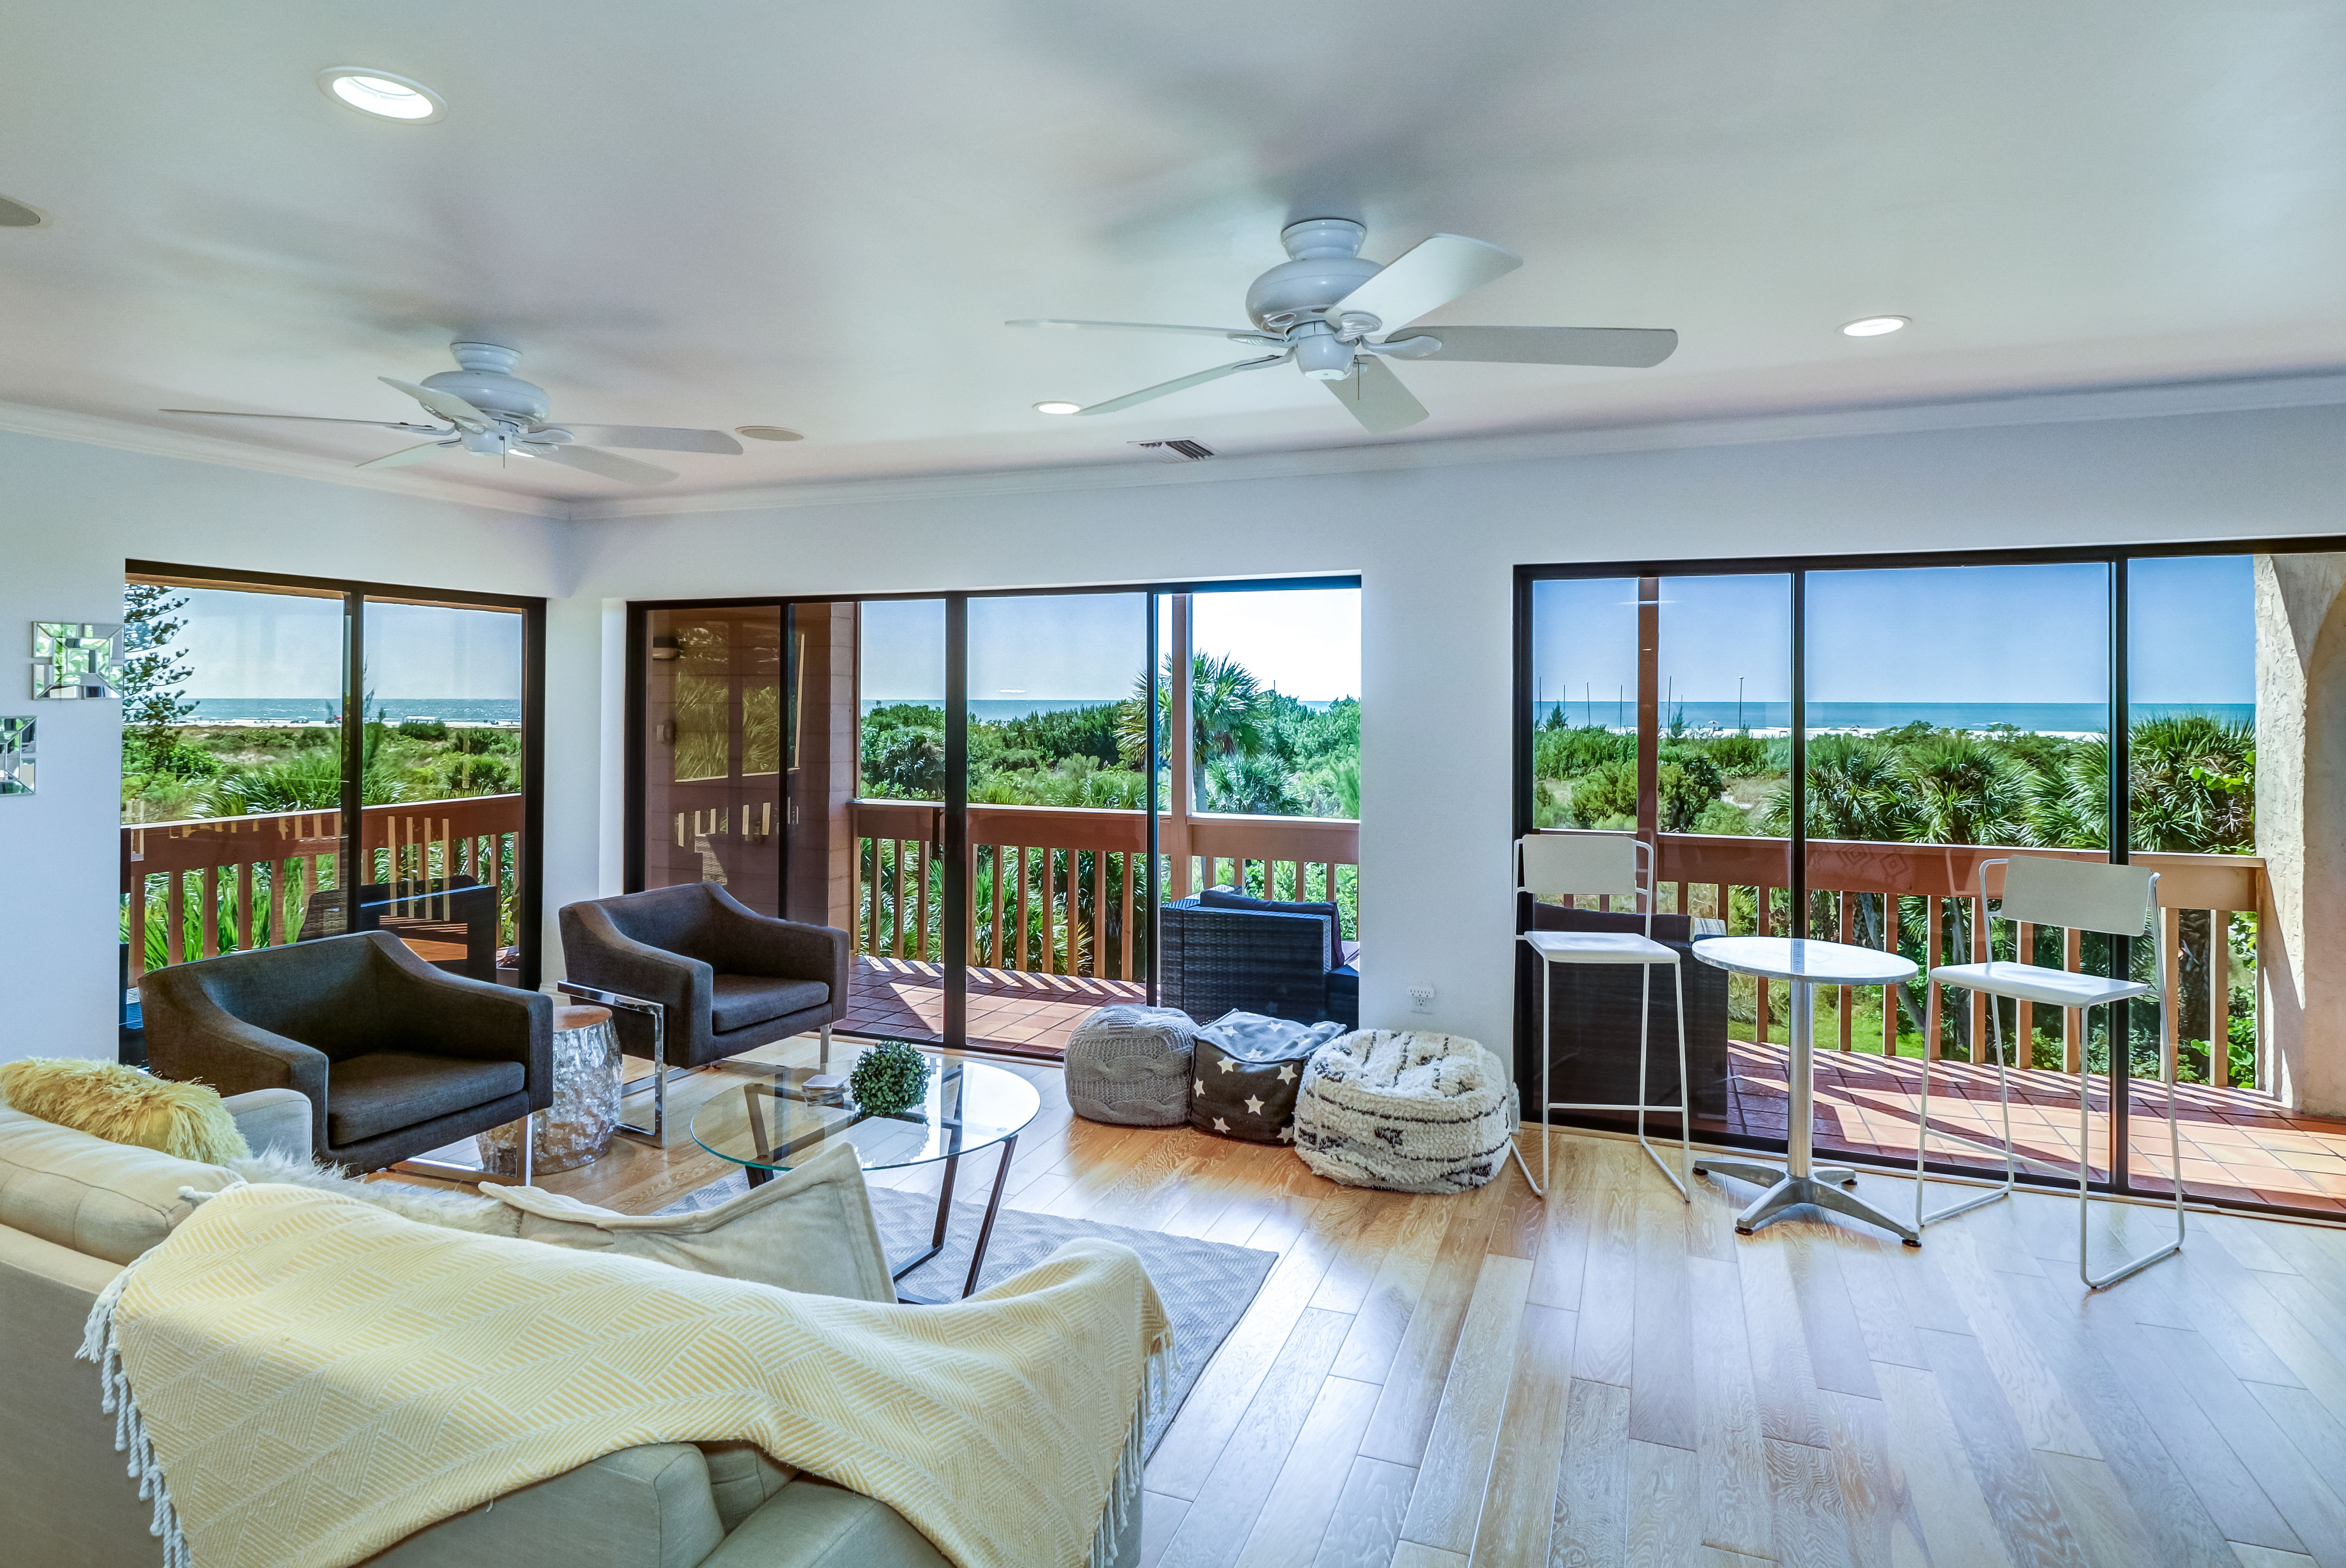 Siesta Key FL Vacation Rental Welcome to Siesta